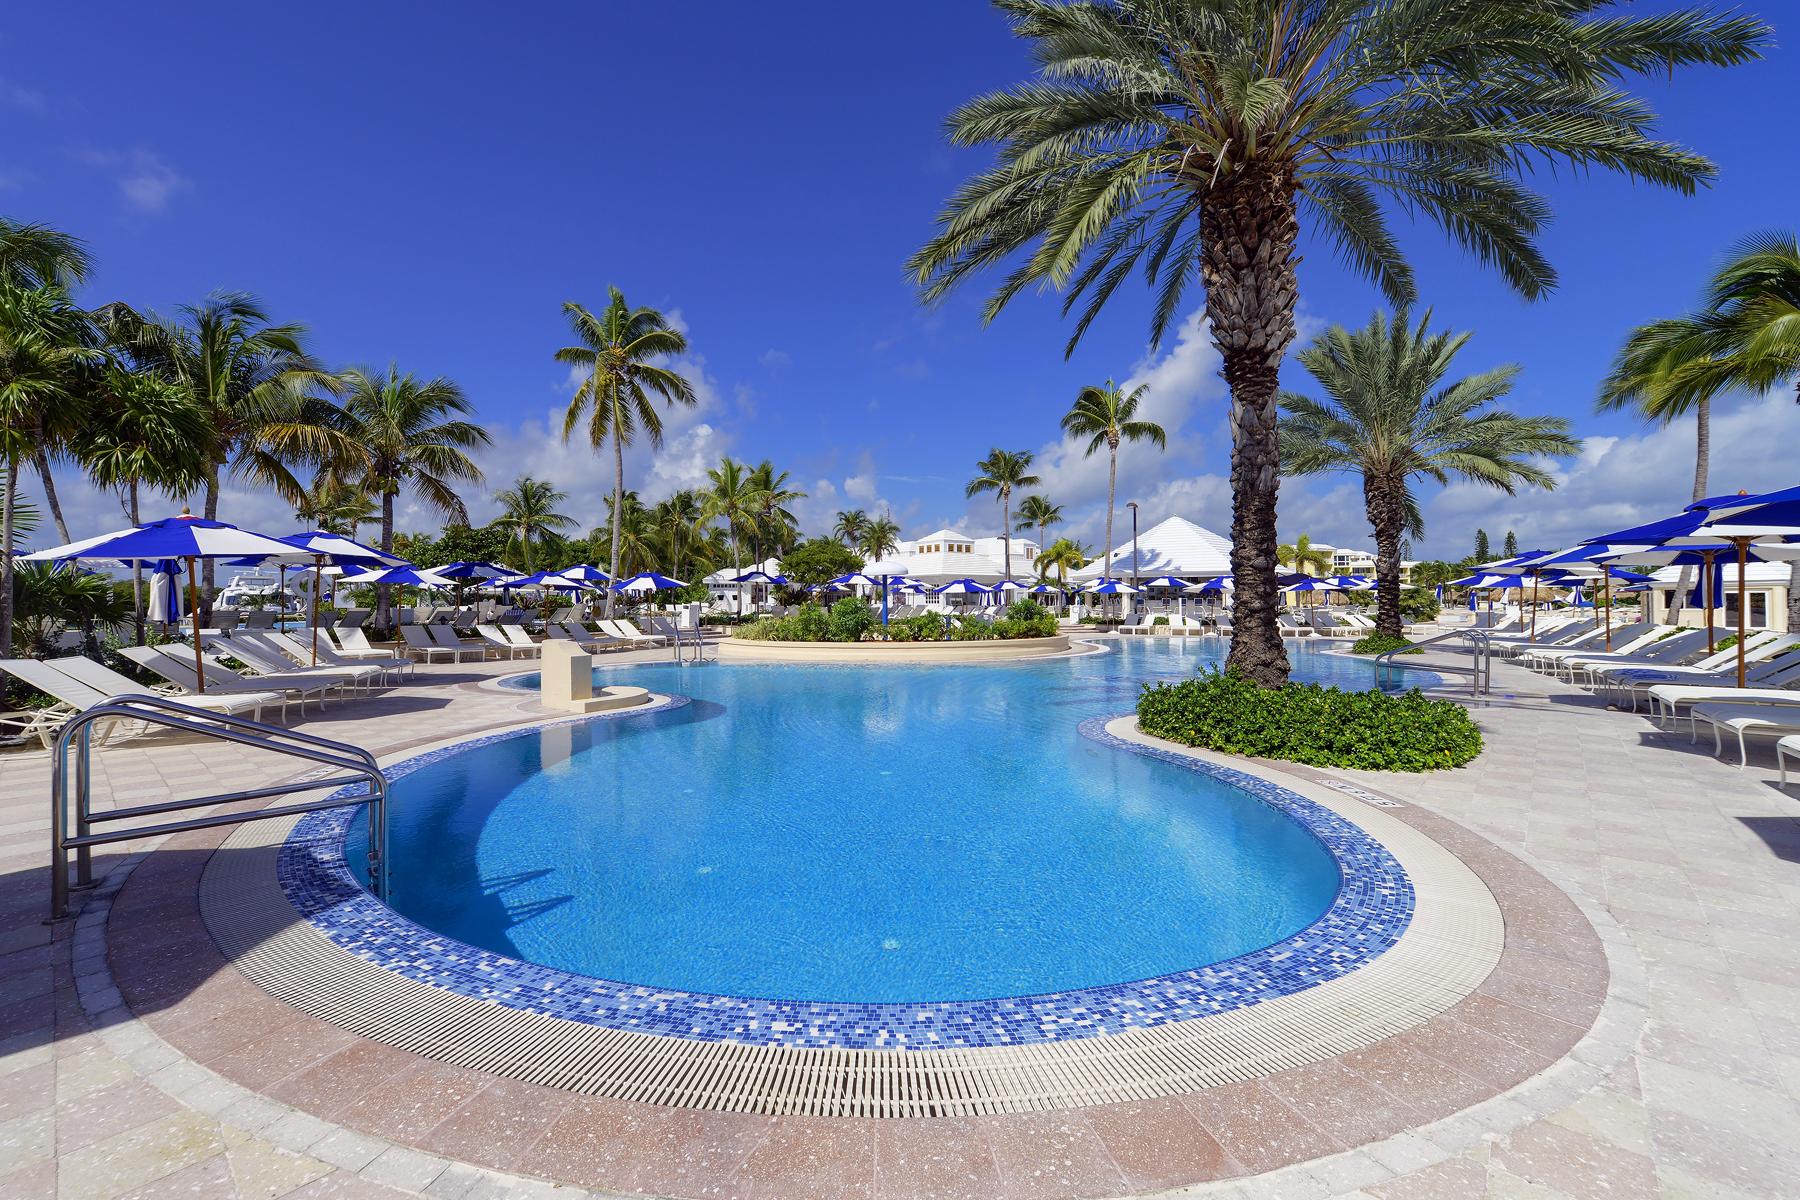 Additional photo for property listing at Marina Village Living at Ocean Reef 17 Marina Drive, Unit A Key Largo, Florida 33037 Usa